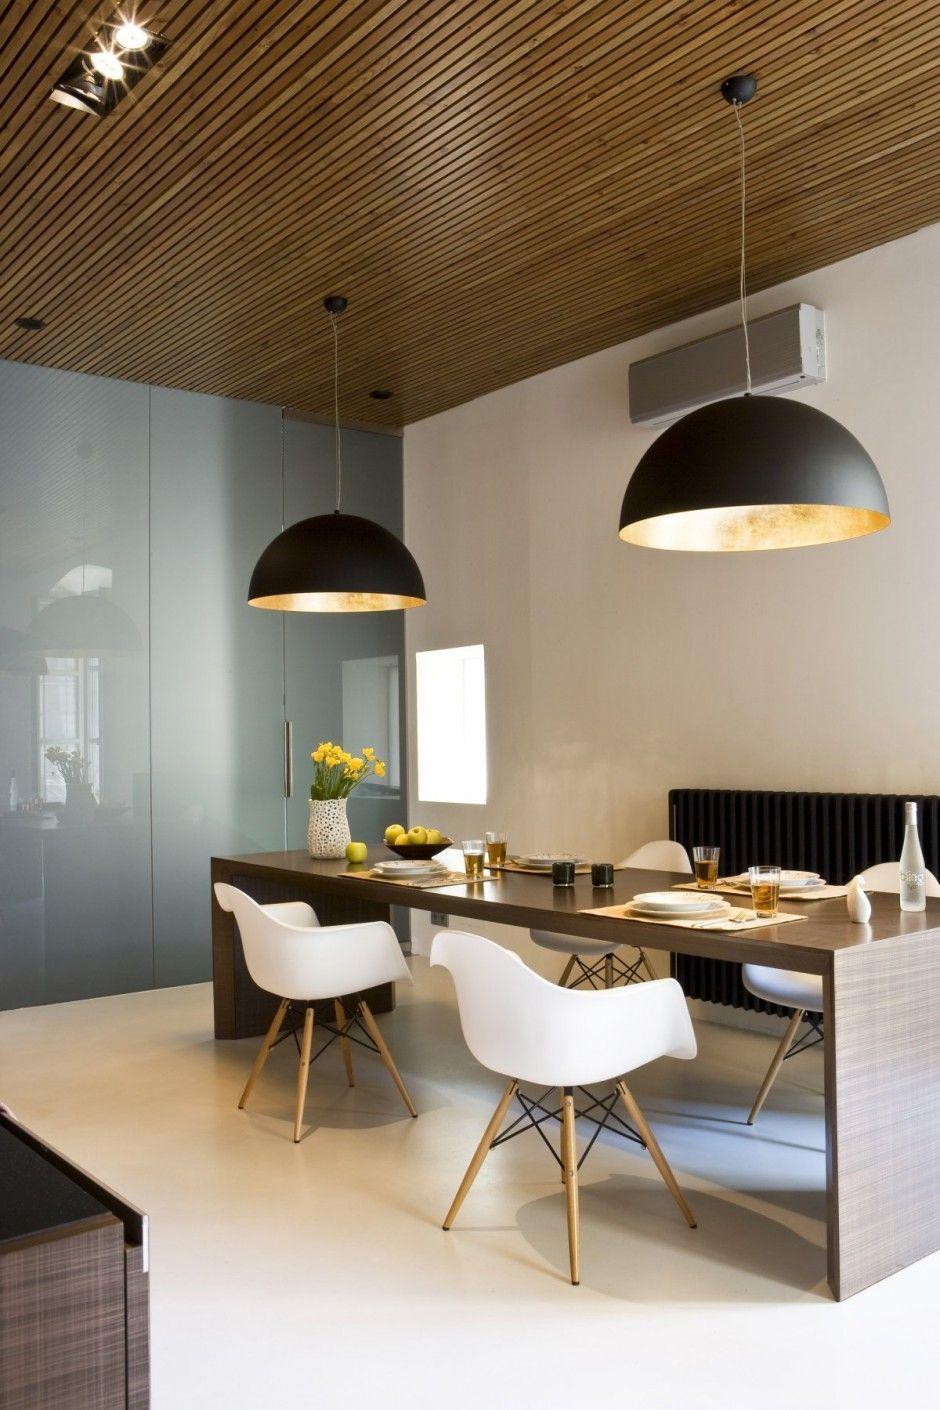 Decoracion de Interiores de un Apartamento Moderno | Decoracion ...